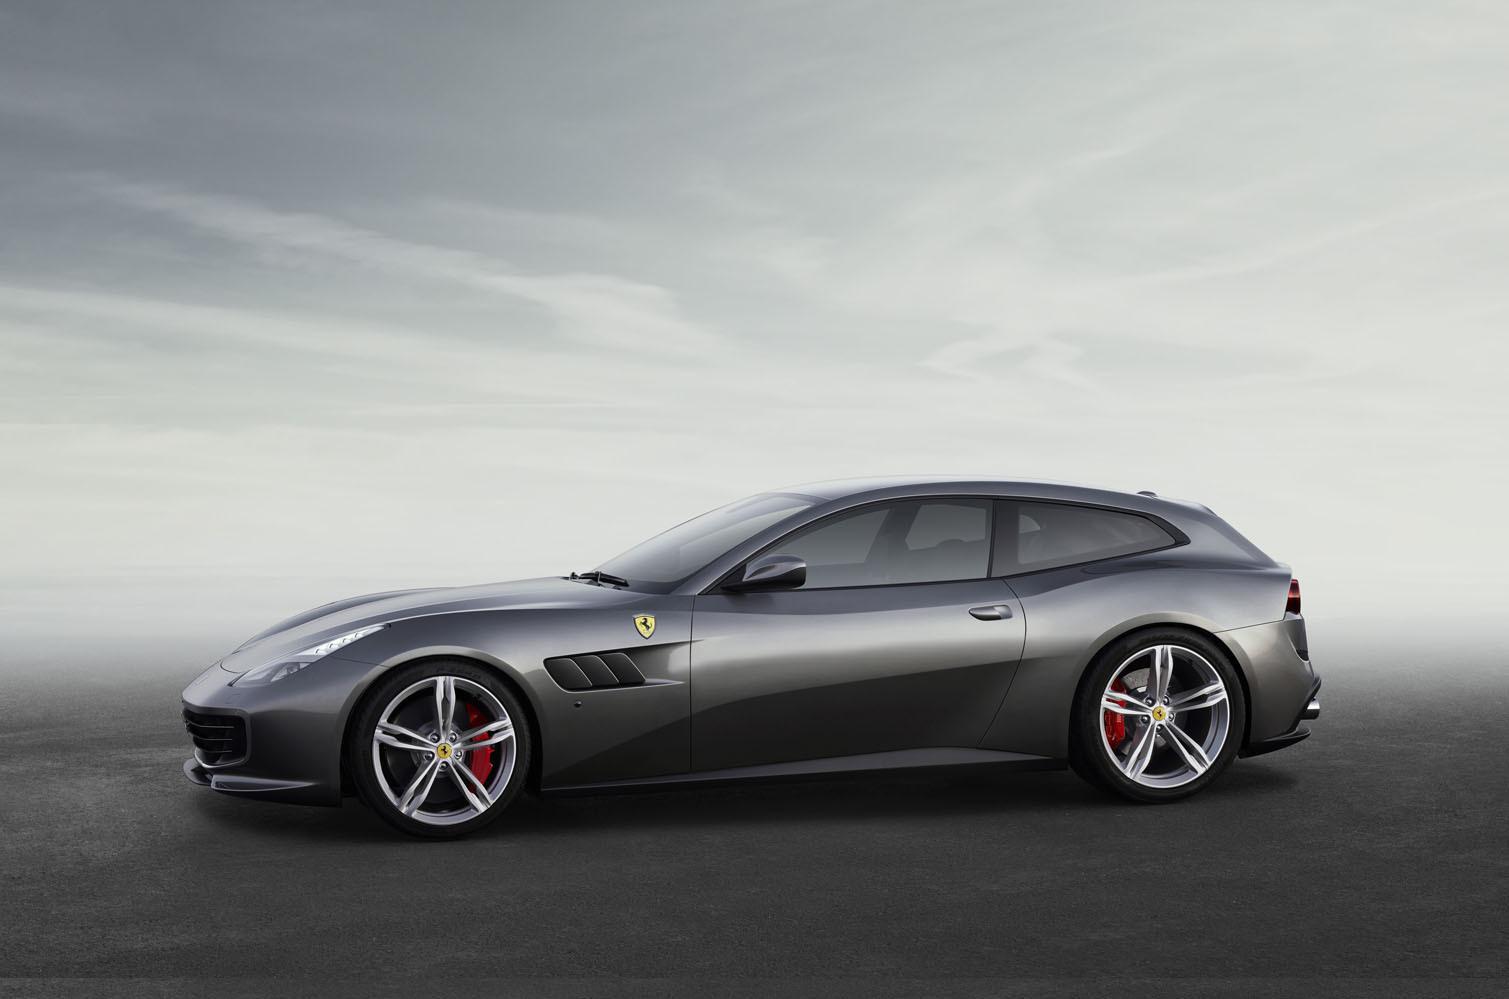 Foto de Ferrari GTC4Lusso (8/9)